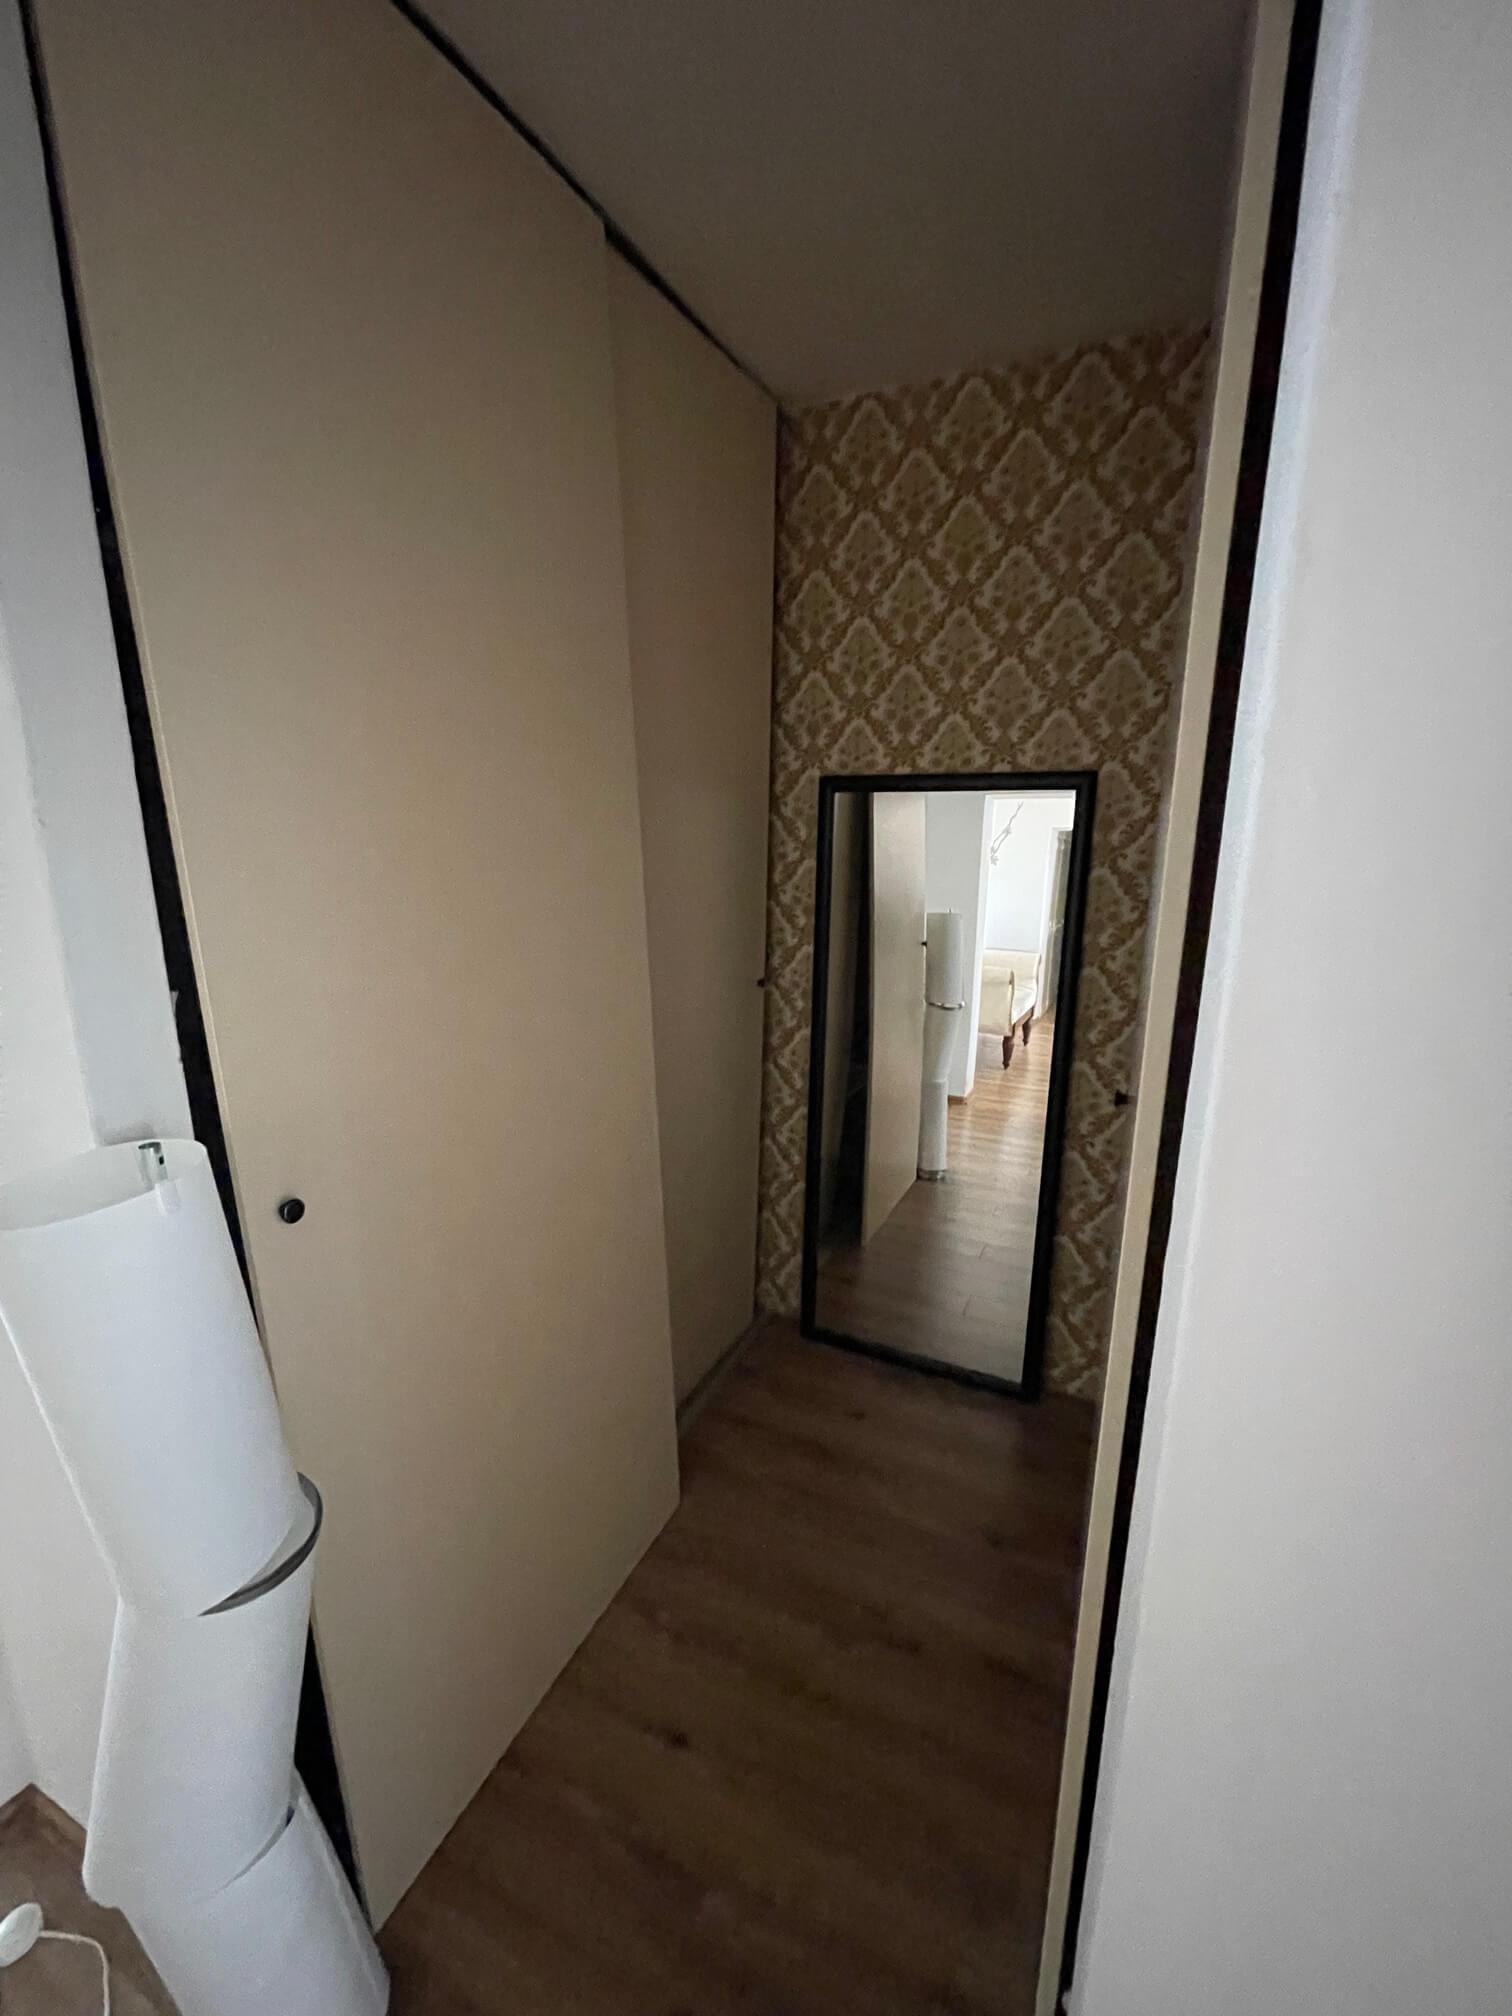 Exkluzívne na prenájom 3 izbový byt, 83m2, 2x loggia 4,5m2, Karolovka, Janotová 8-12